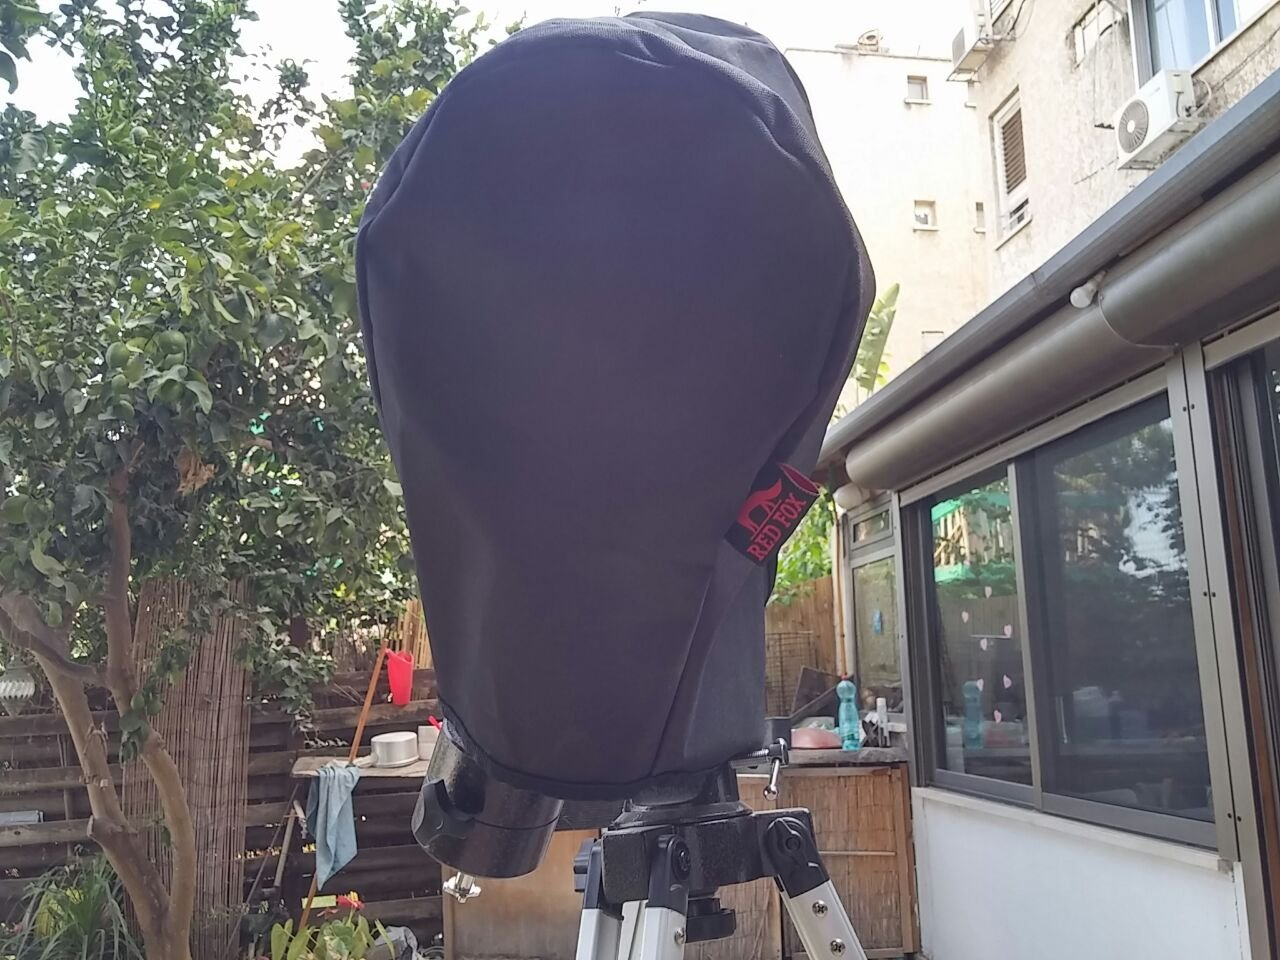 Telescope Cover for Celestron 127eq Powerseeker Telescope by Red Fox